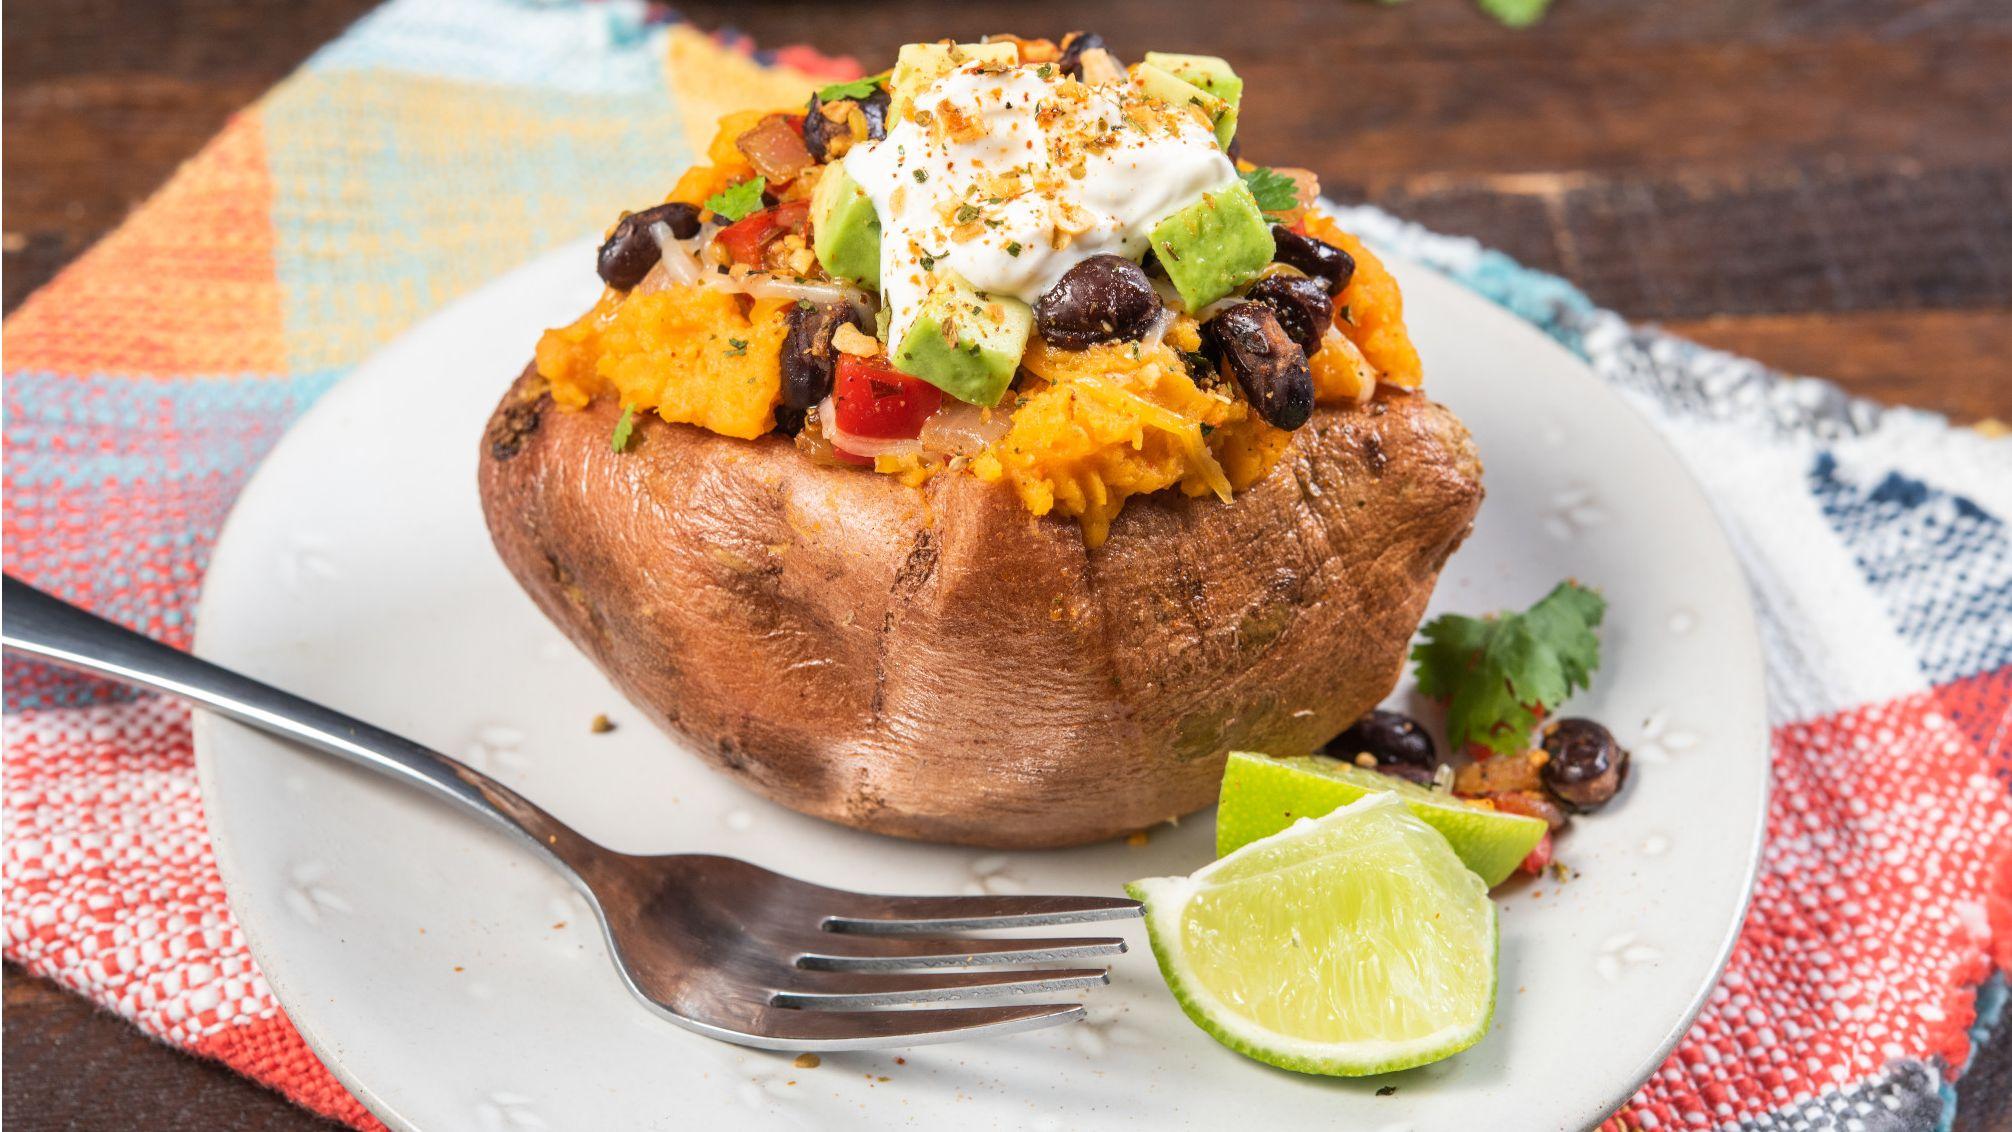 loaded_sweet_potato_mexican_taco_truck_seasoning_a_hint_of_sea_salt5953.jpg